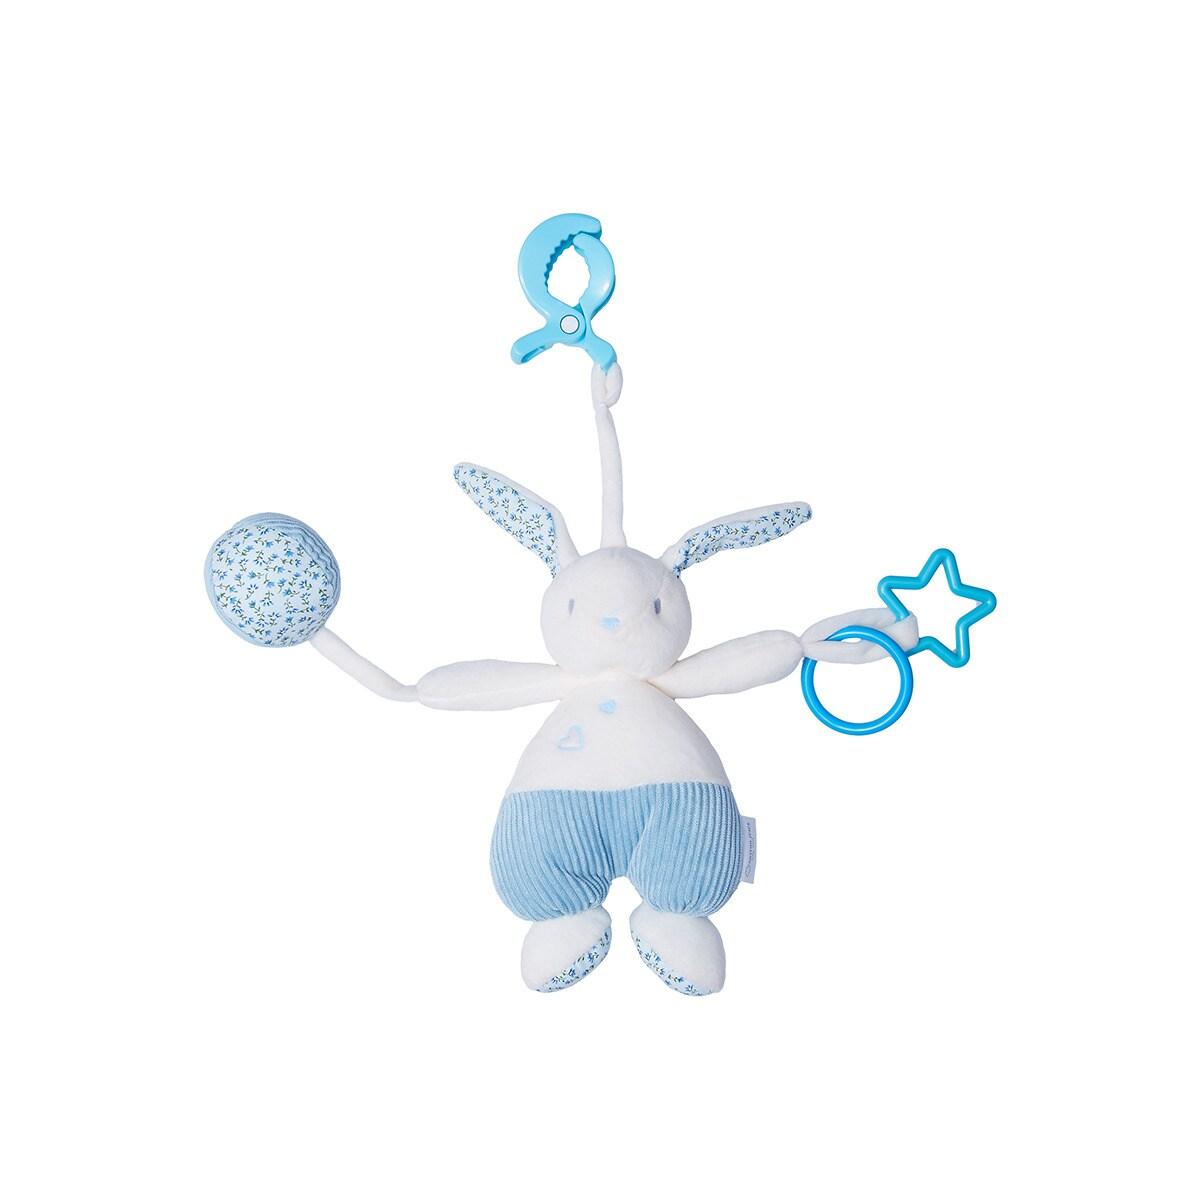 Peluche Mini Conejo Cotton Juice Baby Home con gancho azul